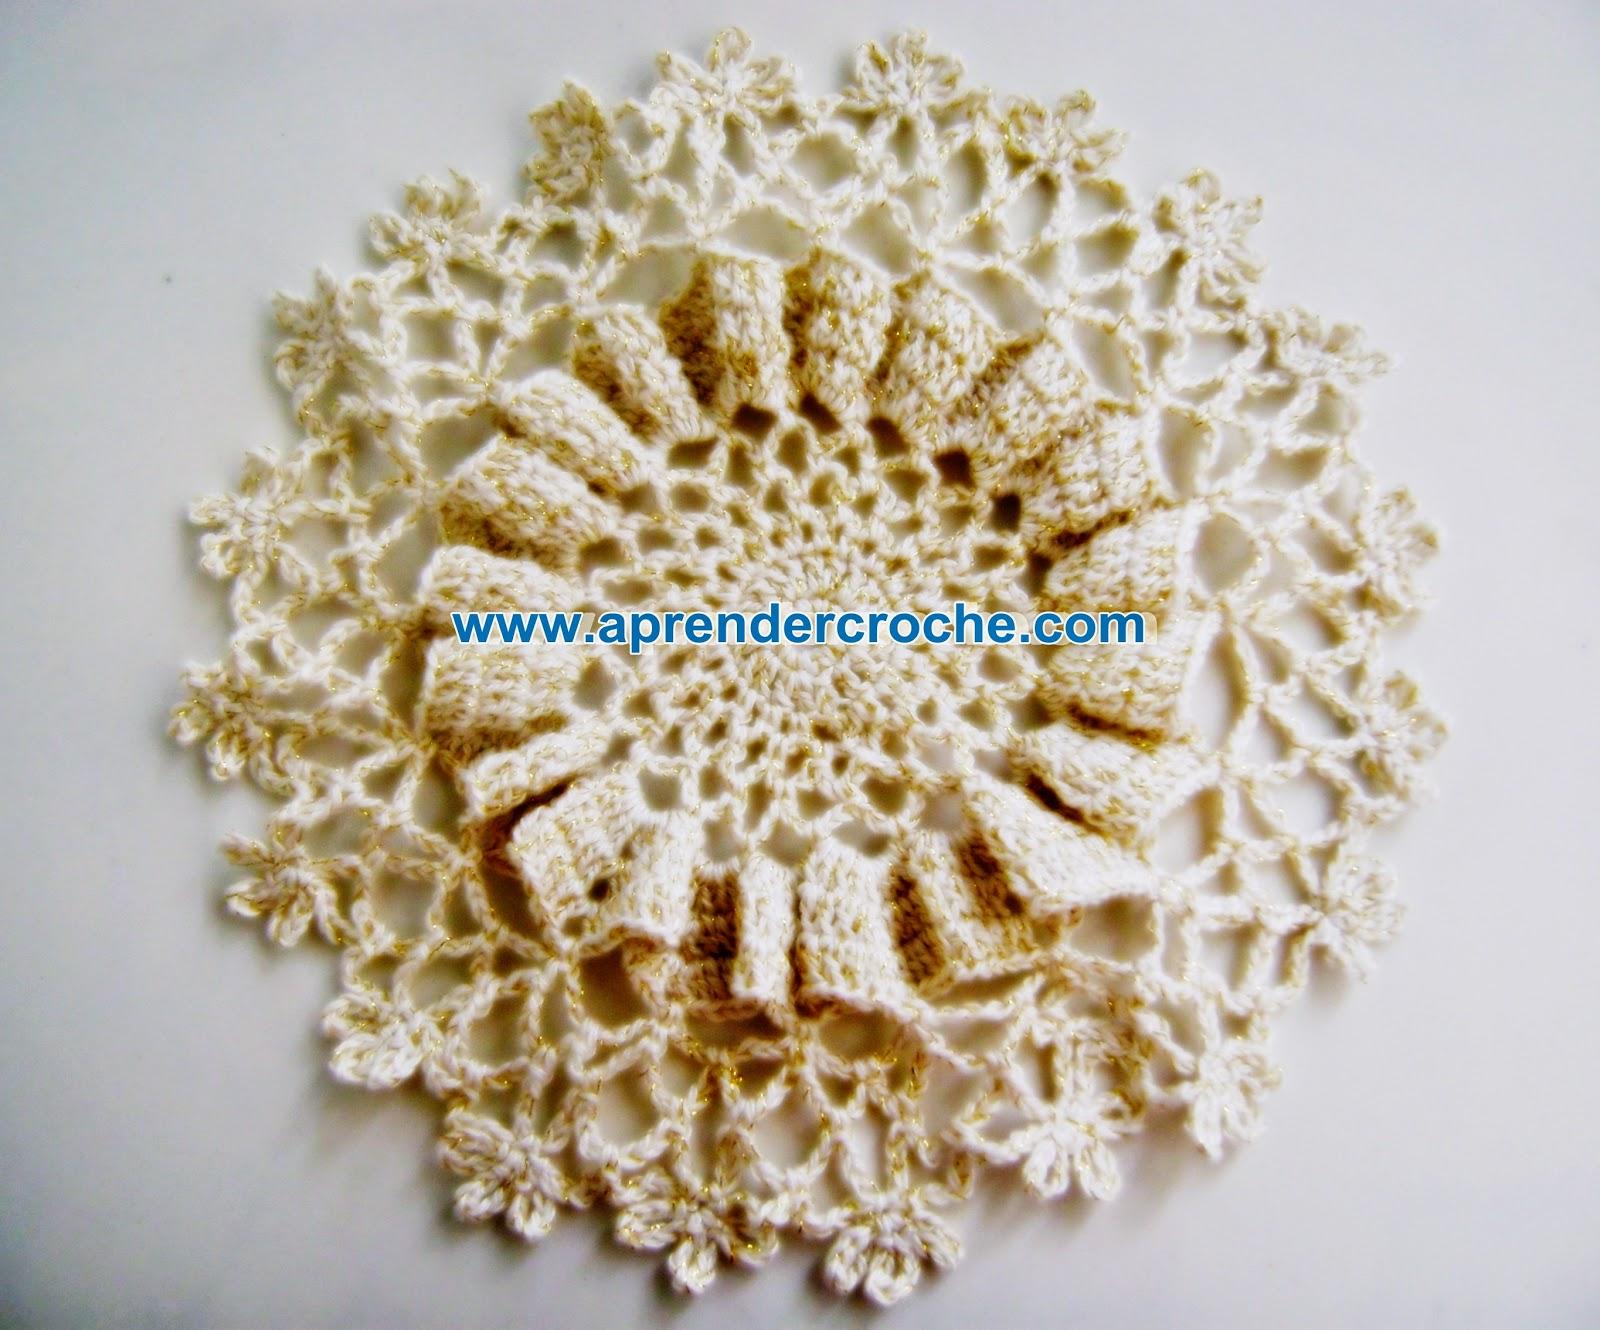 aprender croche toalhinhas brilho noroeste dvd loja curso de croche edinir-croche